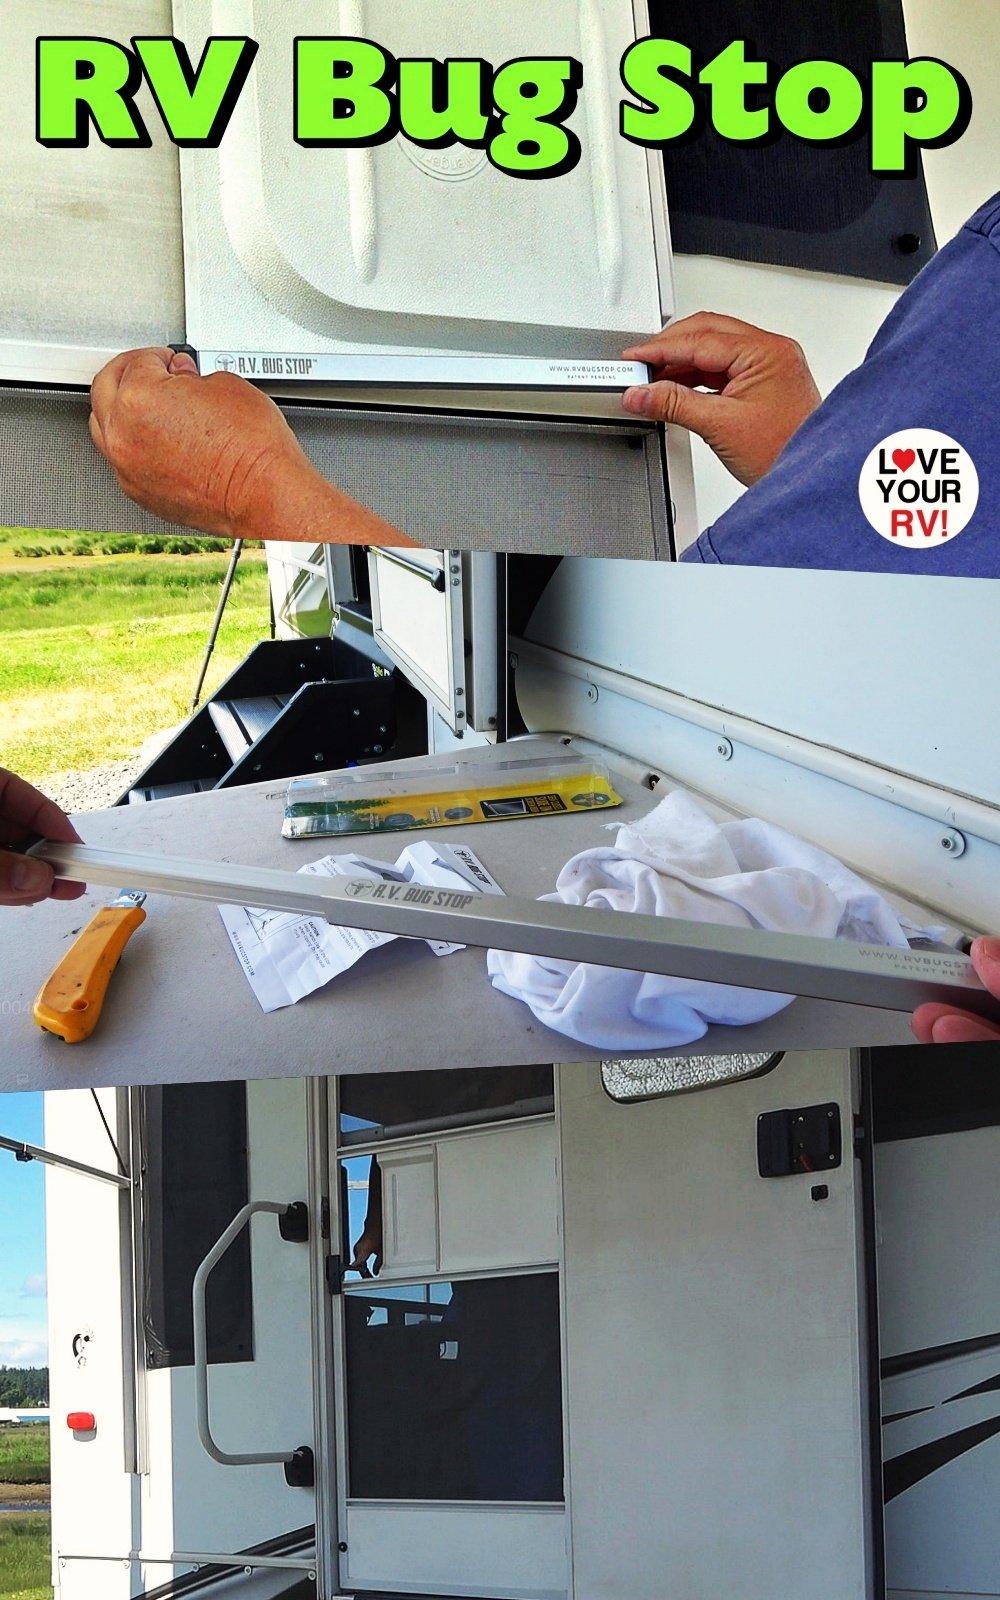 Installing the RV Bug Stop auto RV screen door flap closer gadget